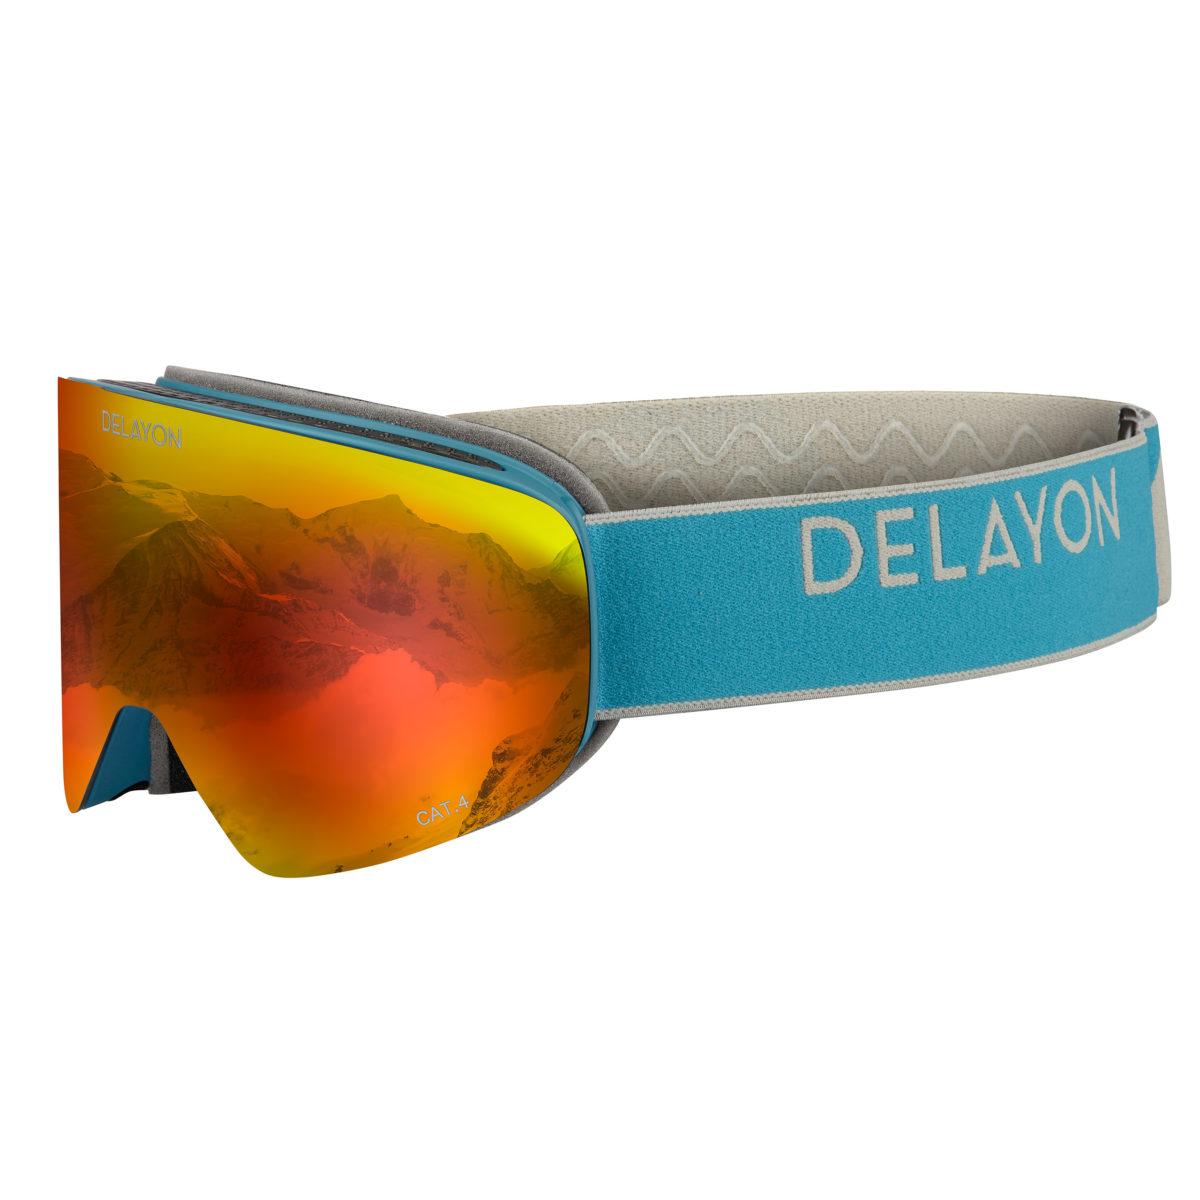 DELAYON Eyewear CORE 2.0 Navy Gray Space Fire